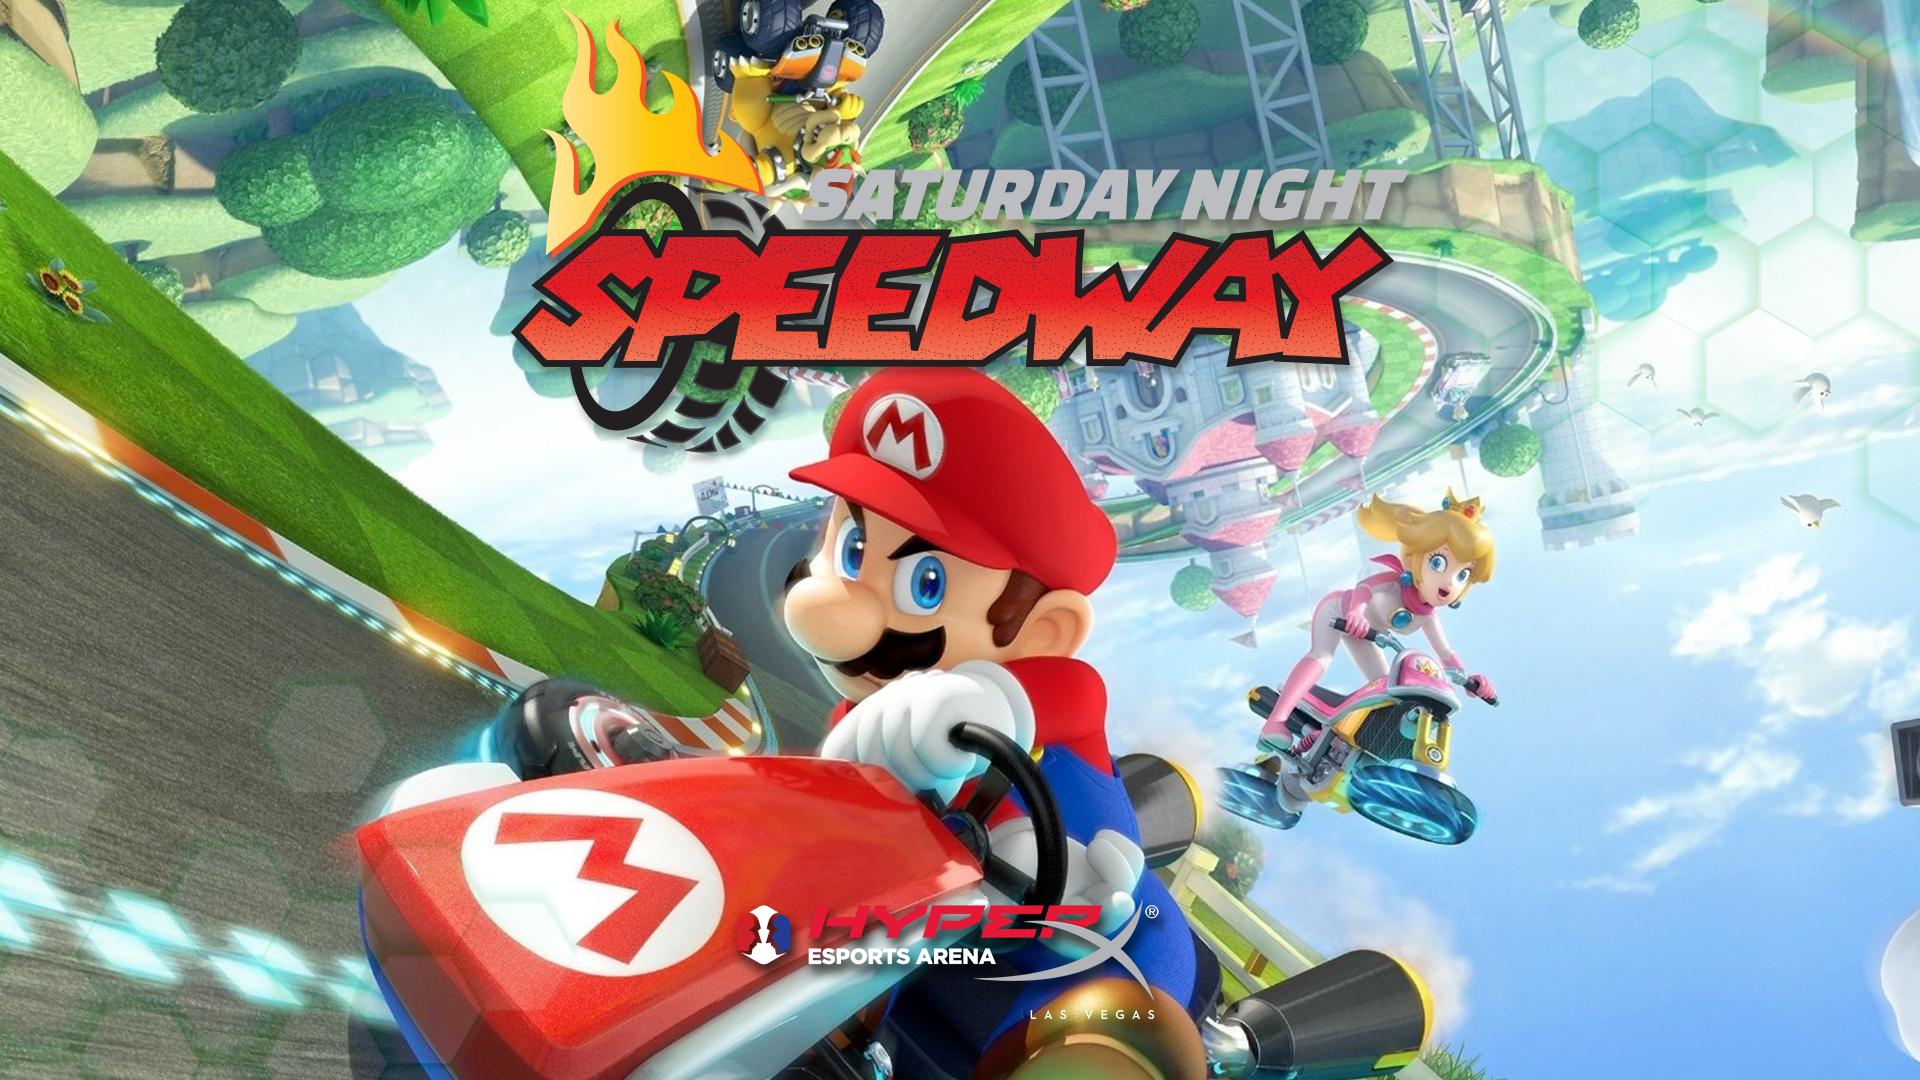 Saturday Night Speedway_.png